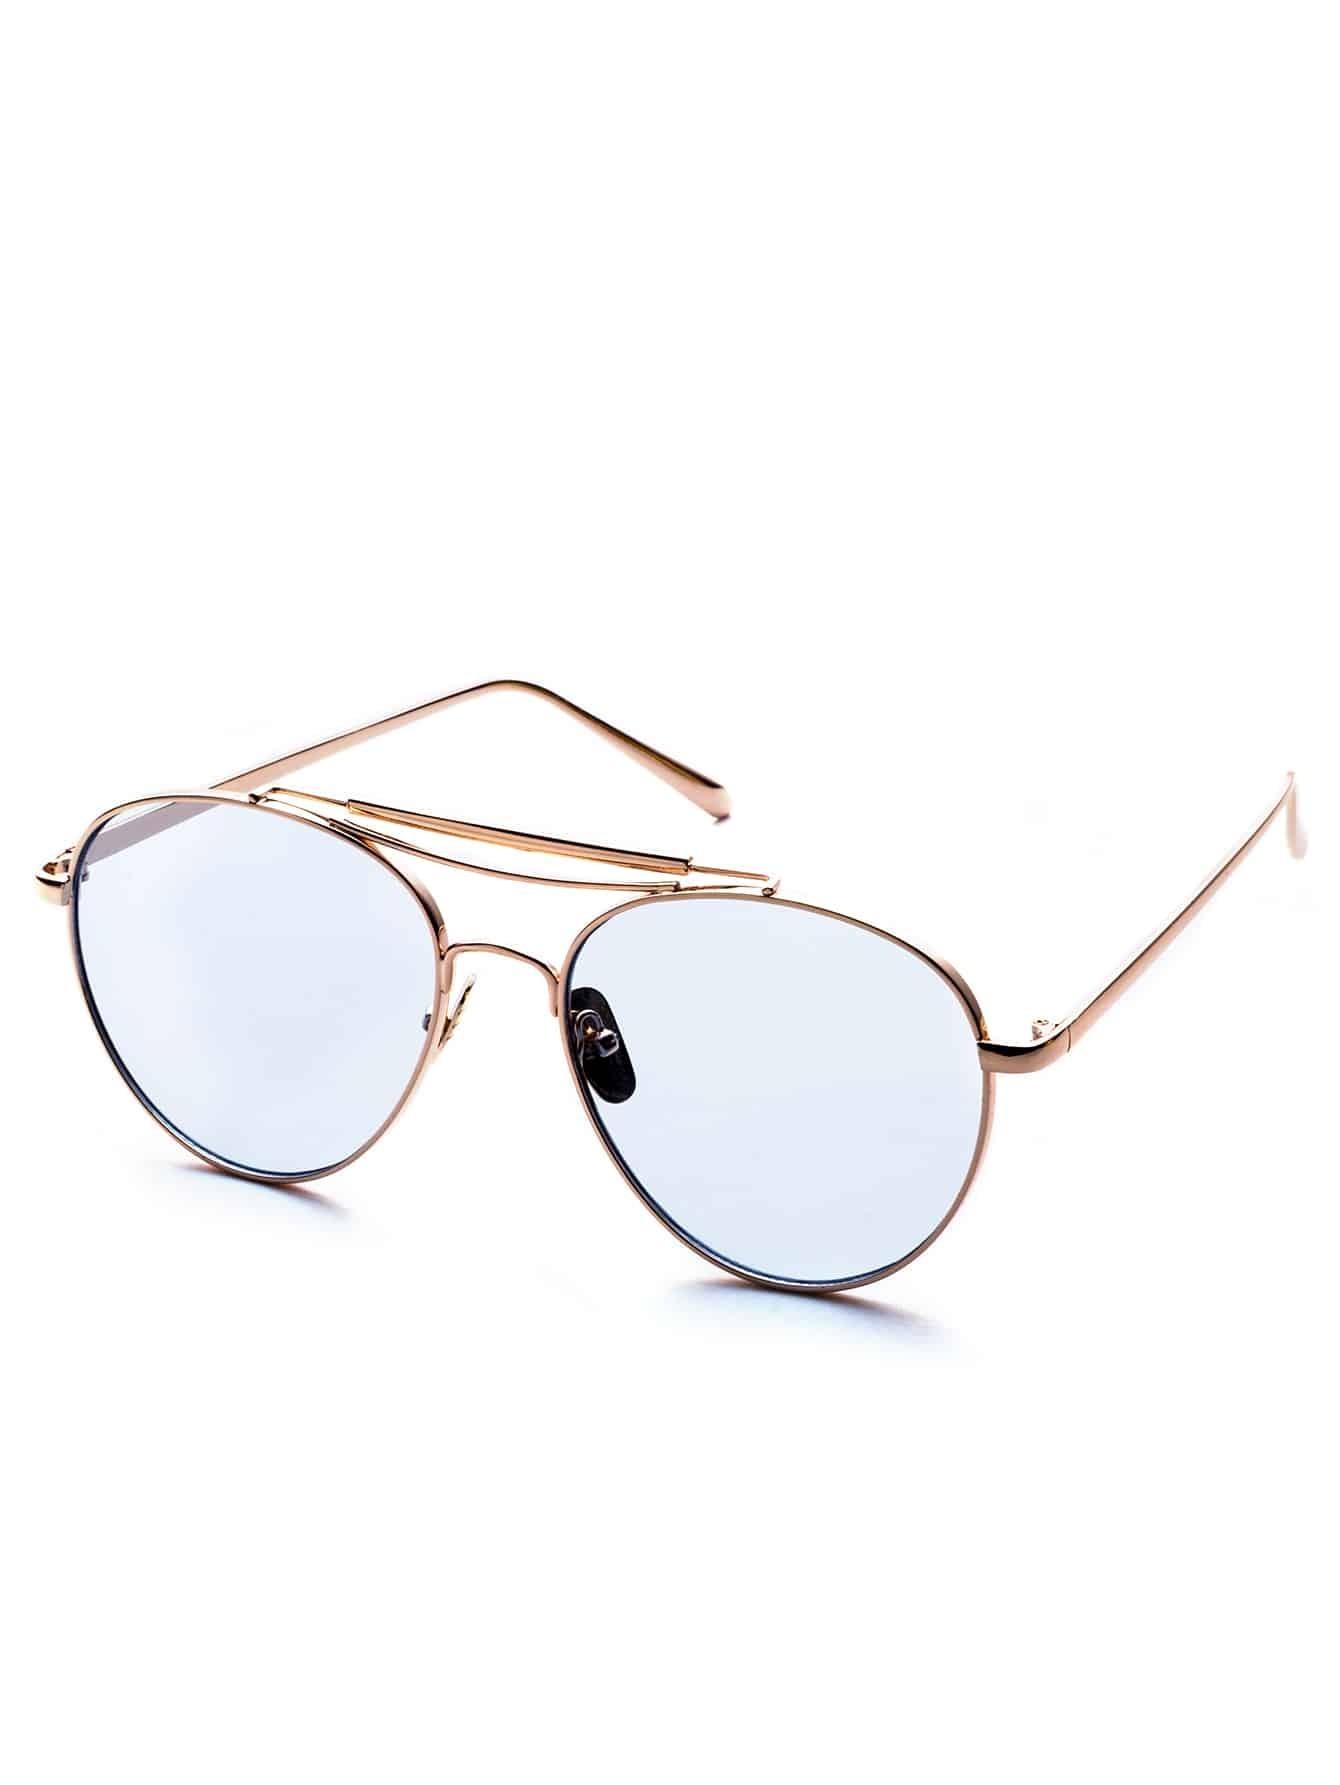 Metal Frame Double Bridge Blue Lens Aviator Sunglasses sunglass160906306